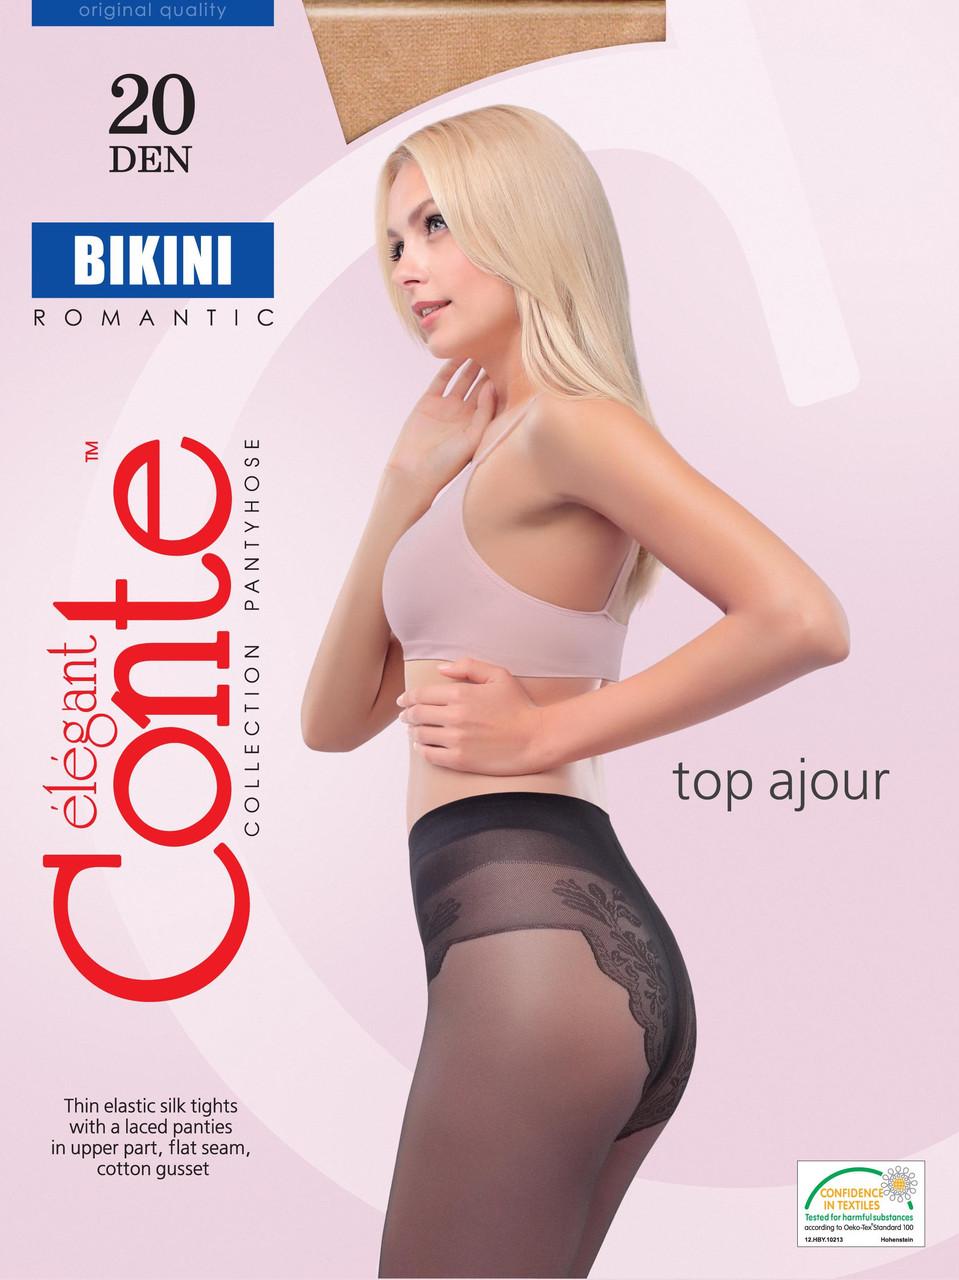 Колготки женские Conte Bikini 20 (Конте Бикини 20), 8С-34СП, размер 2-4, ажурные трусики